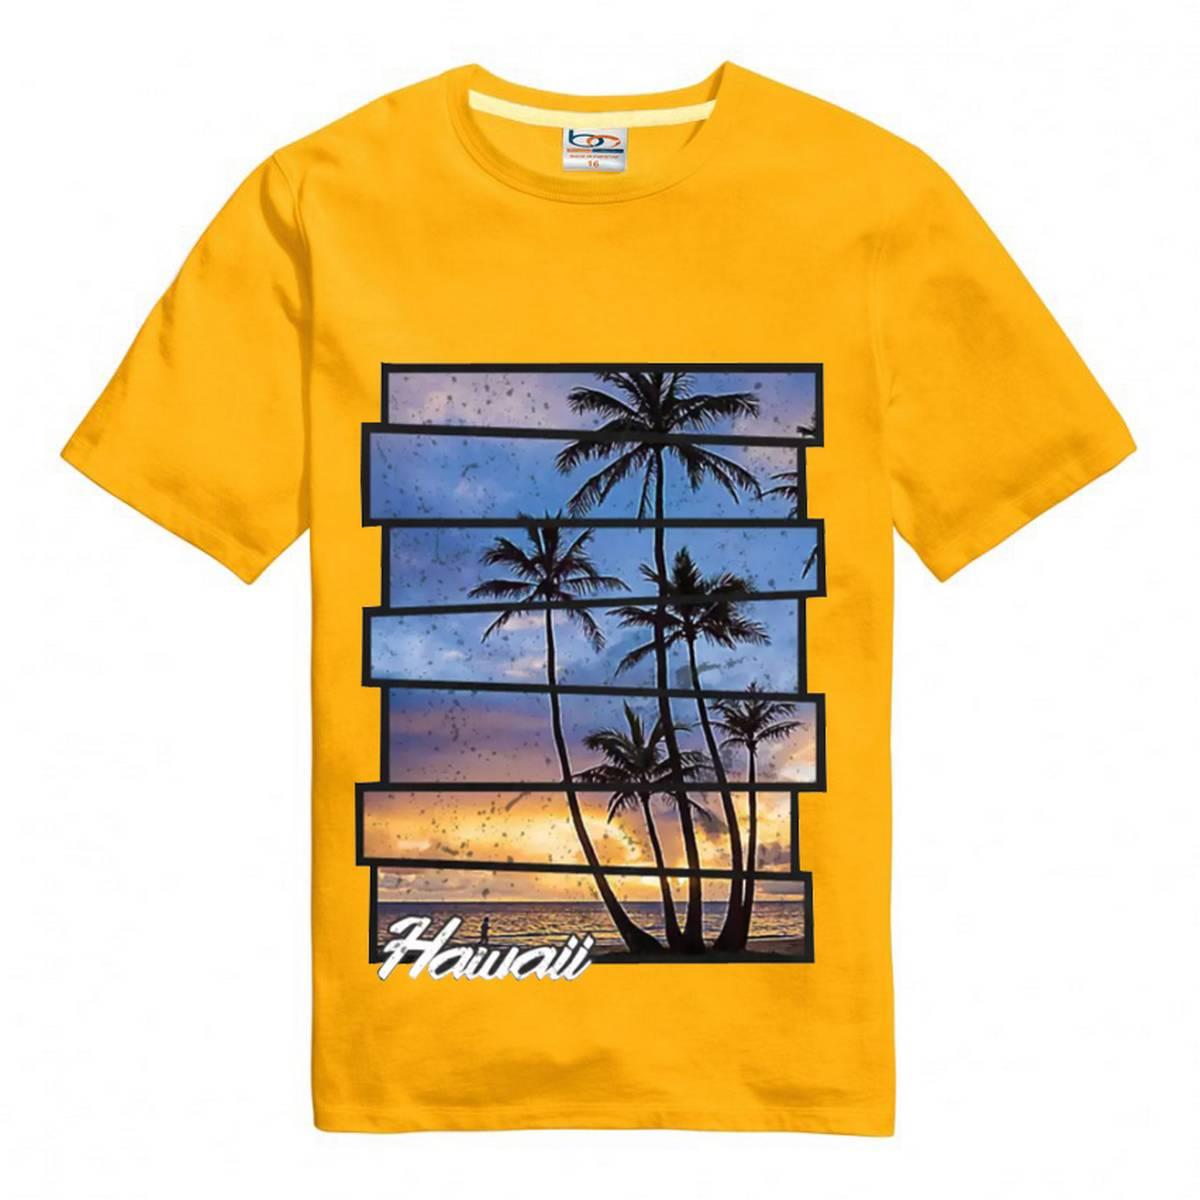 Bindas Collection Summer Digital Printed T-Shirt For Kids